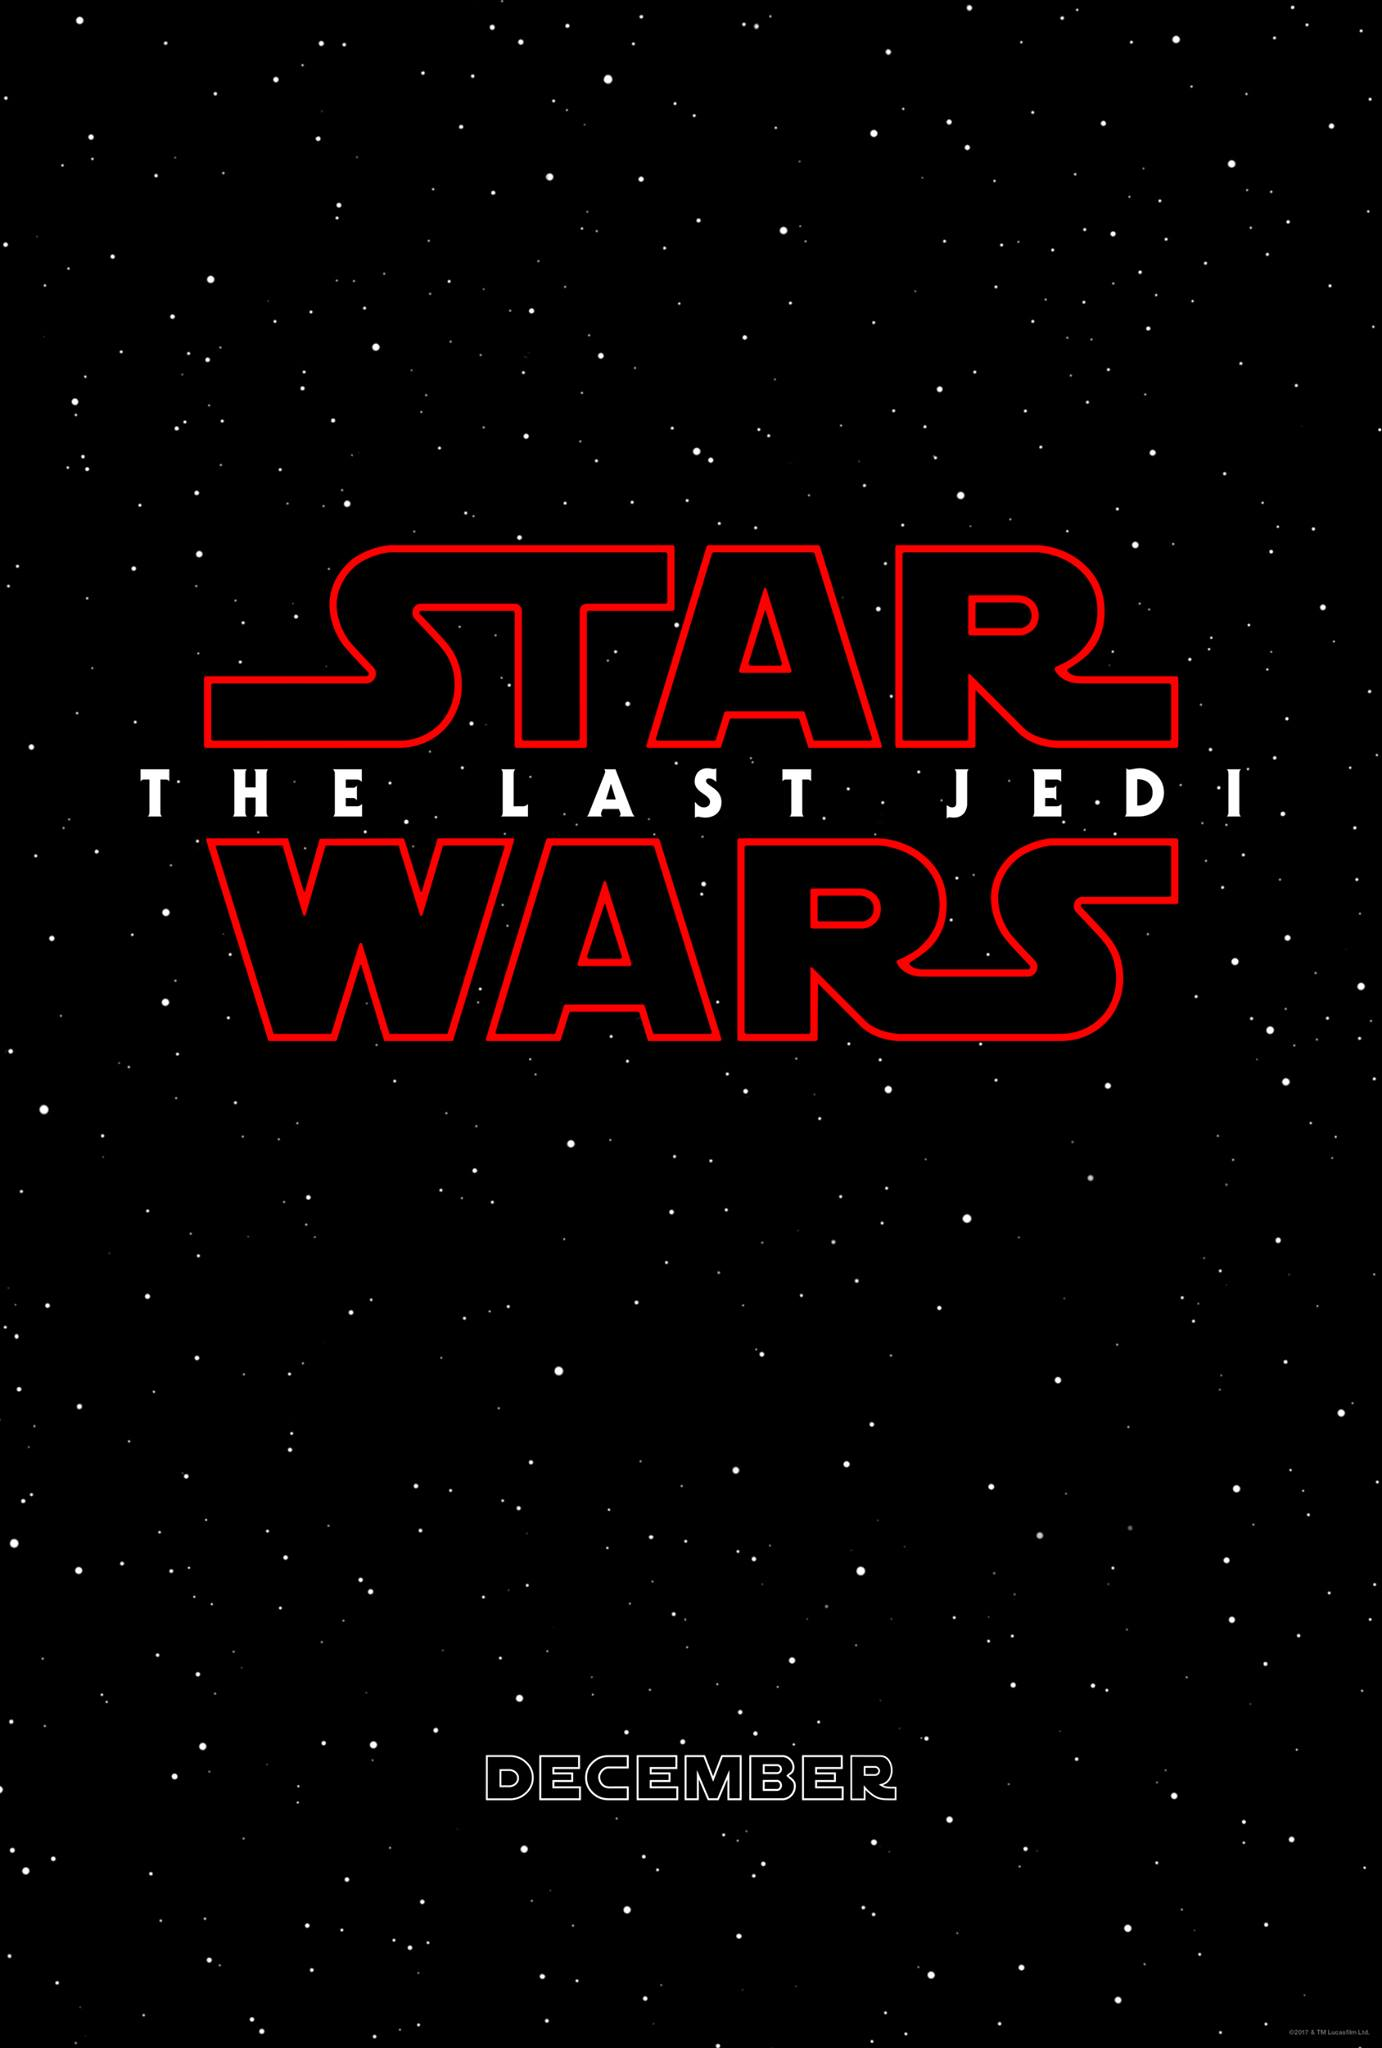 Star Wars Episode VIII The Last Jedi Movie Poster Teaser